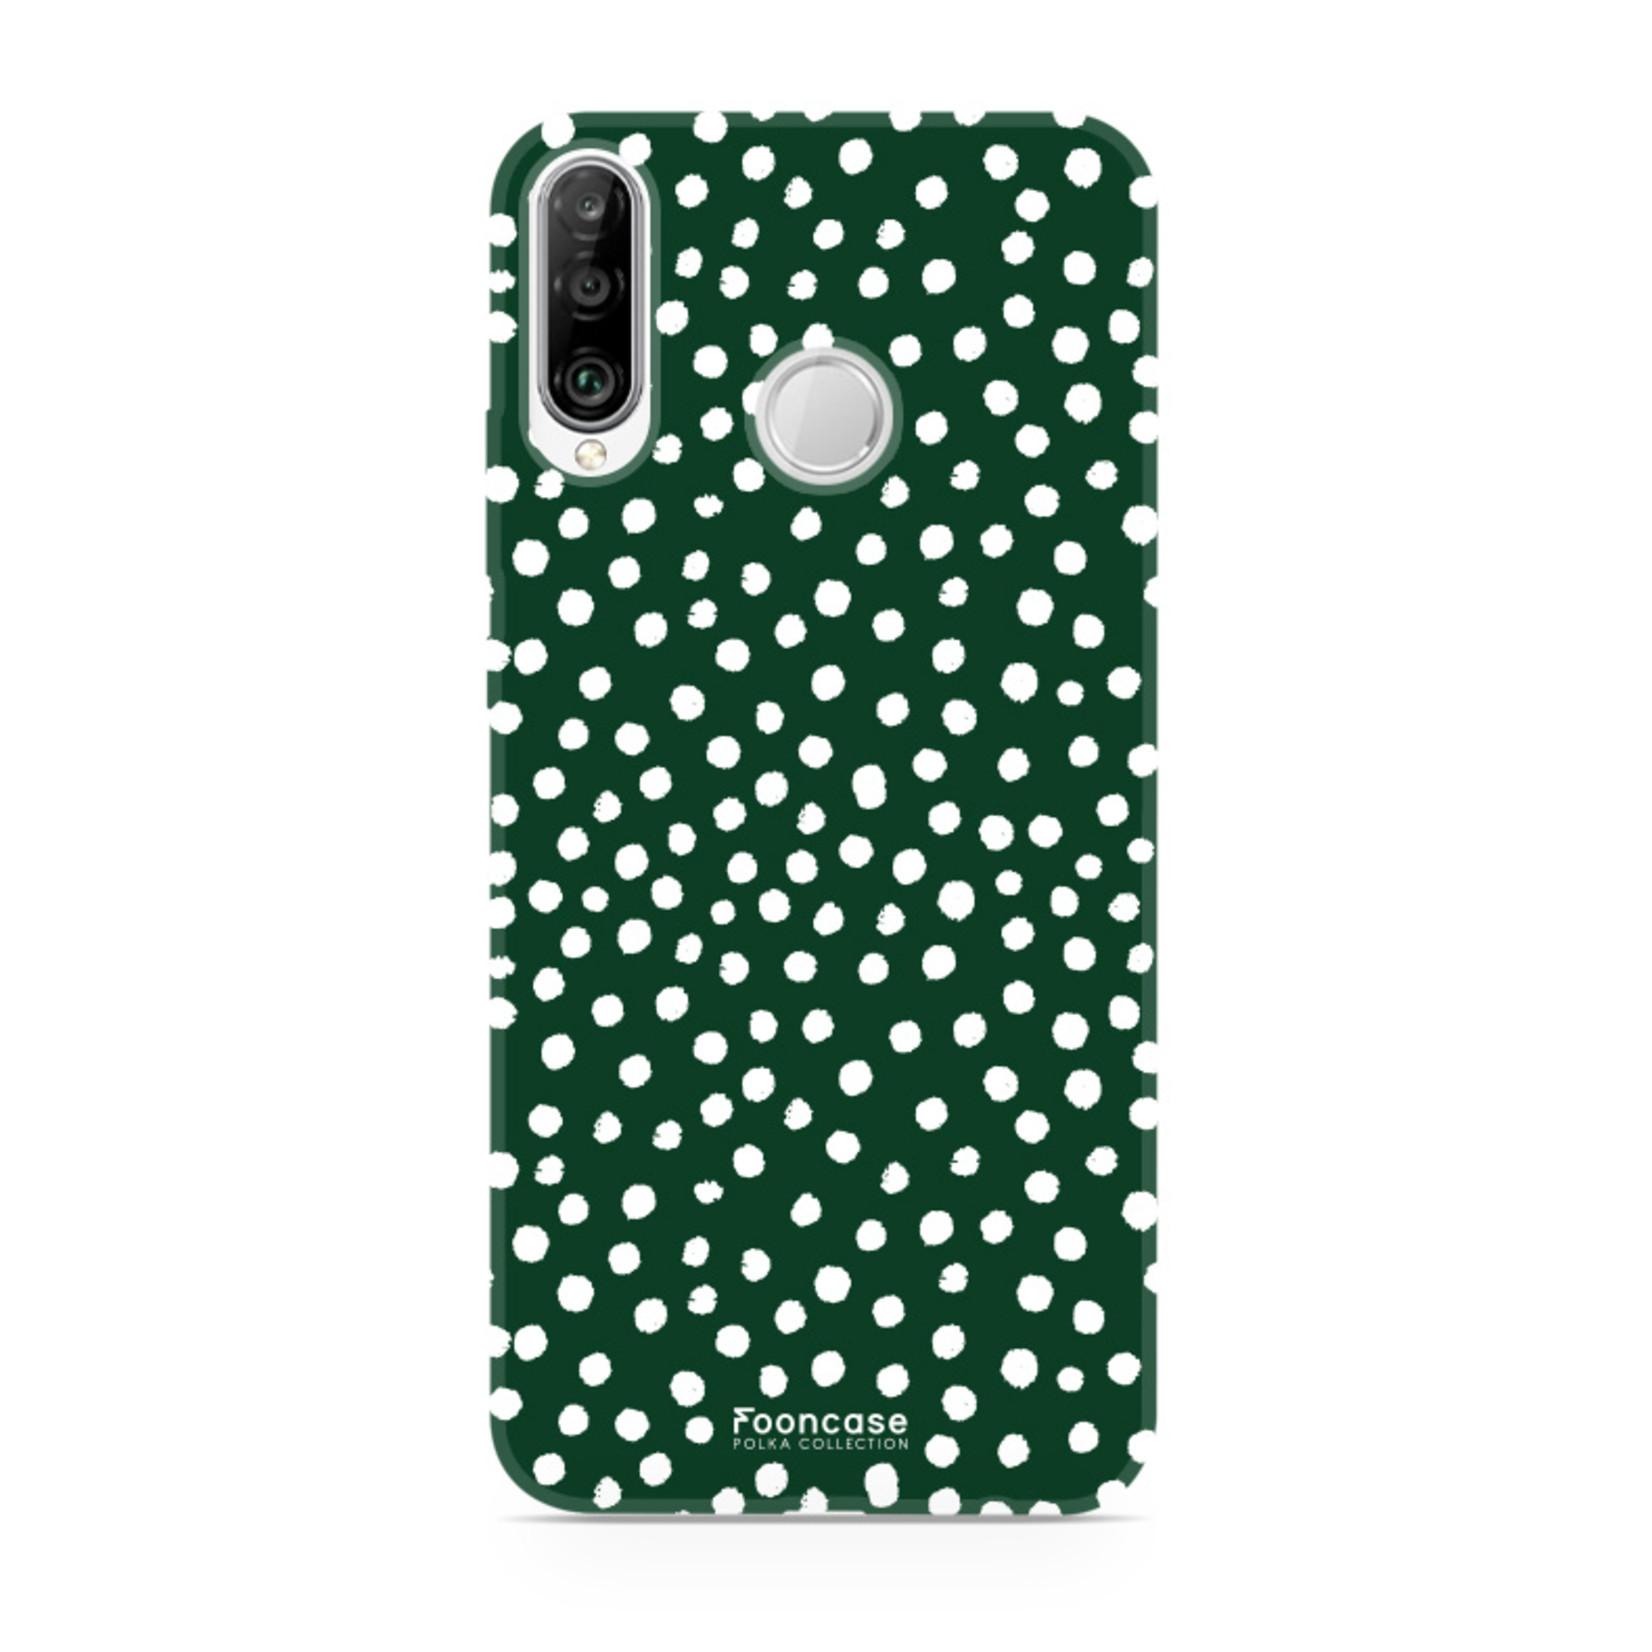 FOONCASE Huawei P30 Lite hoesje TPU Soft Case - Back Cover - POLKA COLLECTION / Stipjes / Stippen / Groen